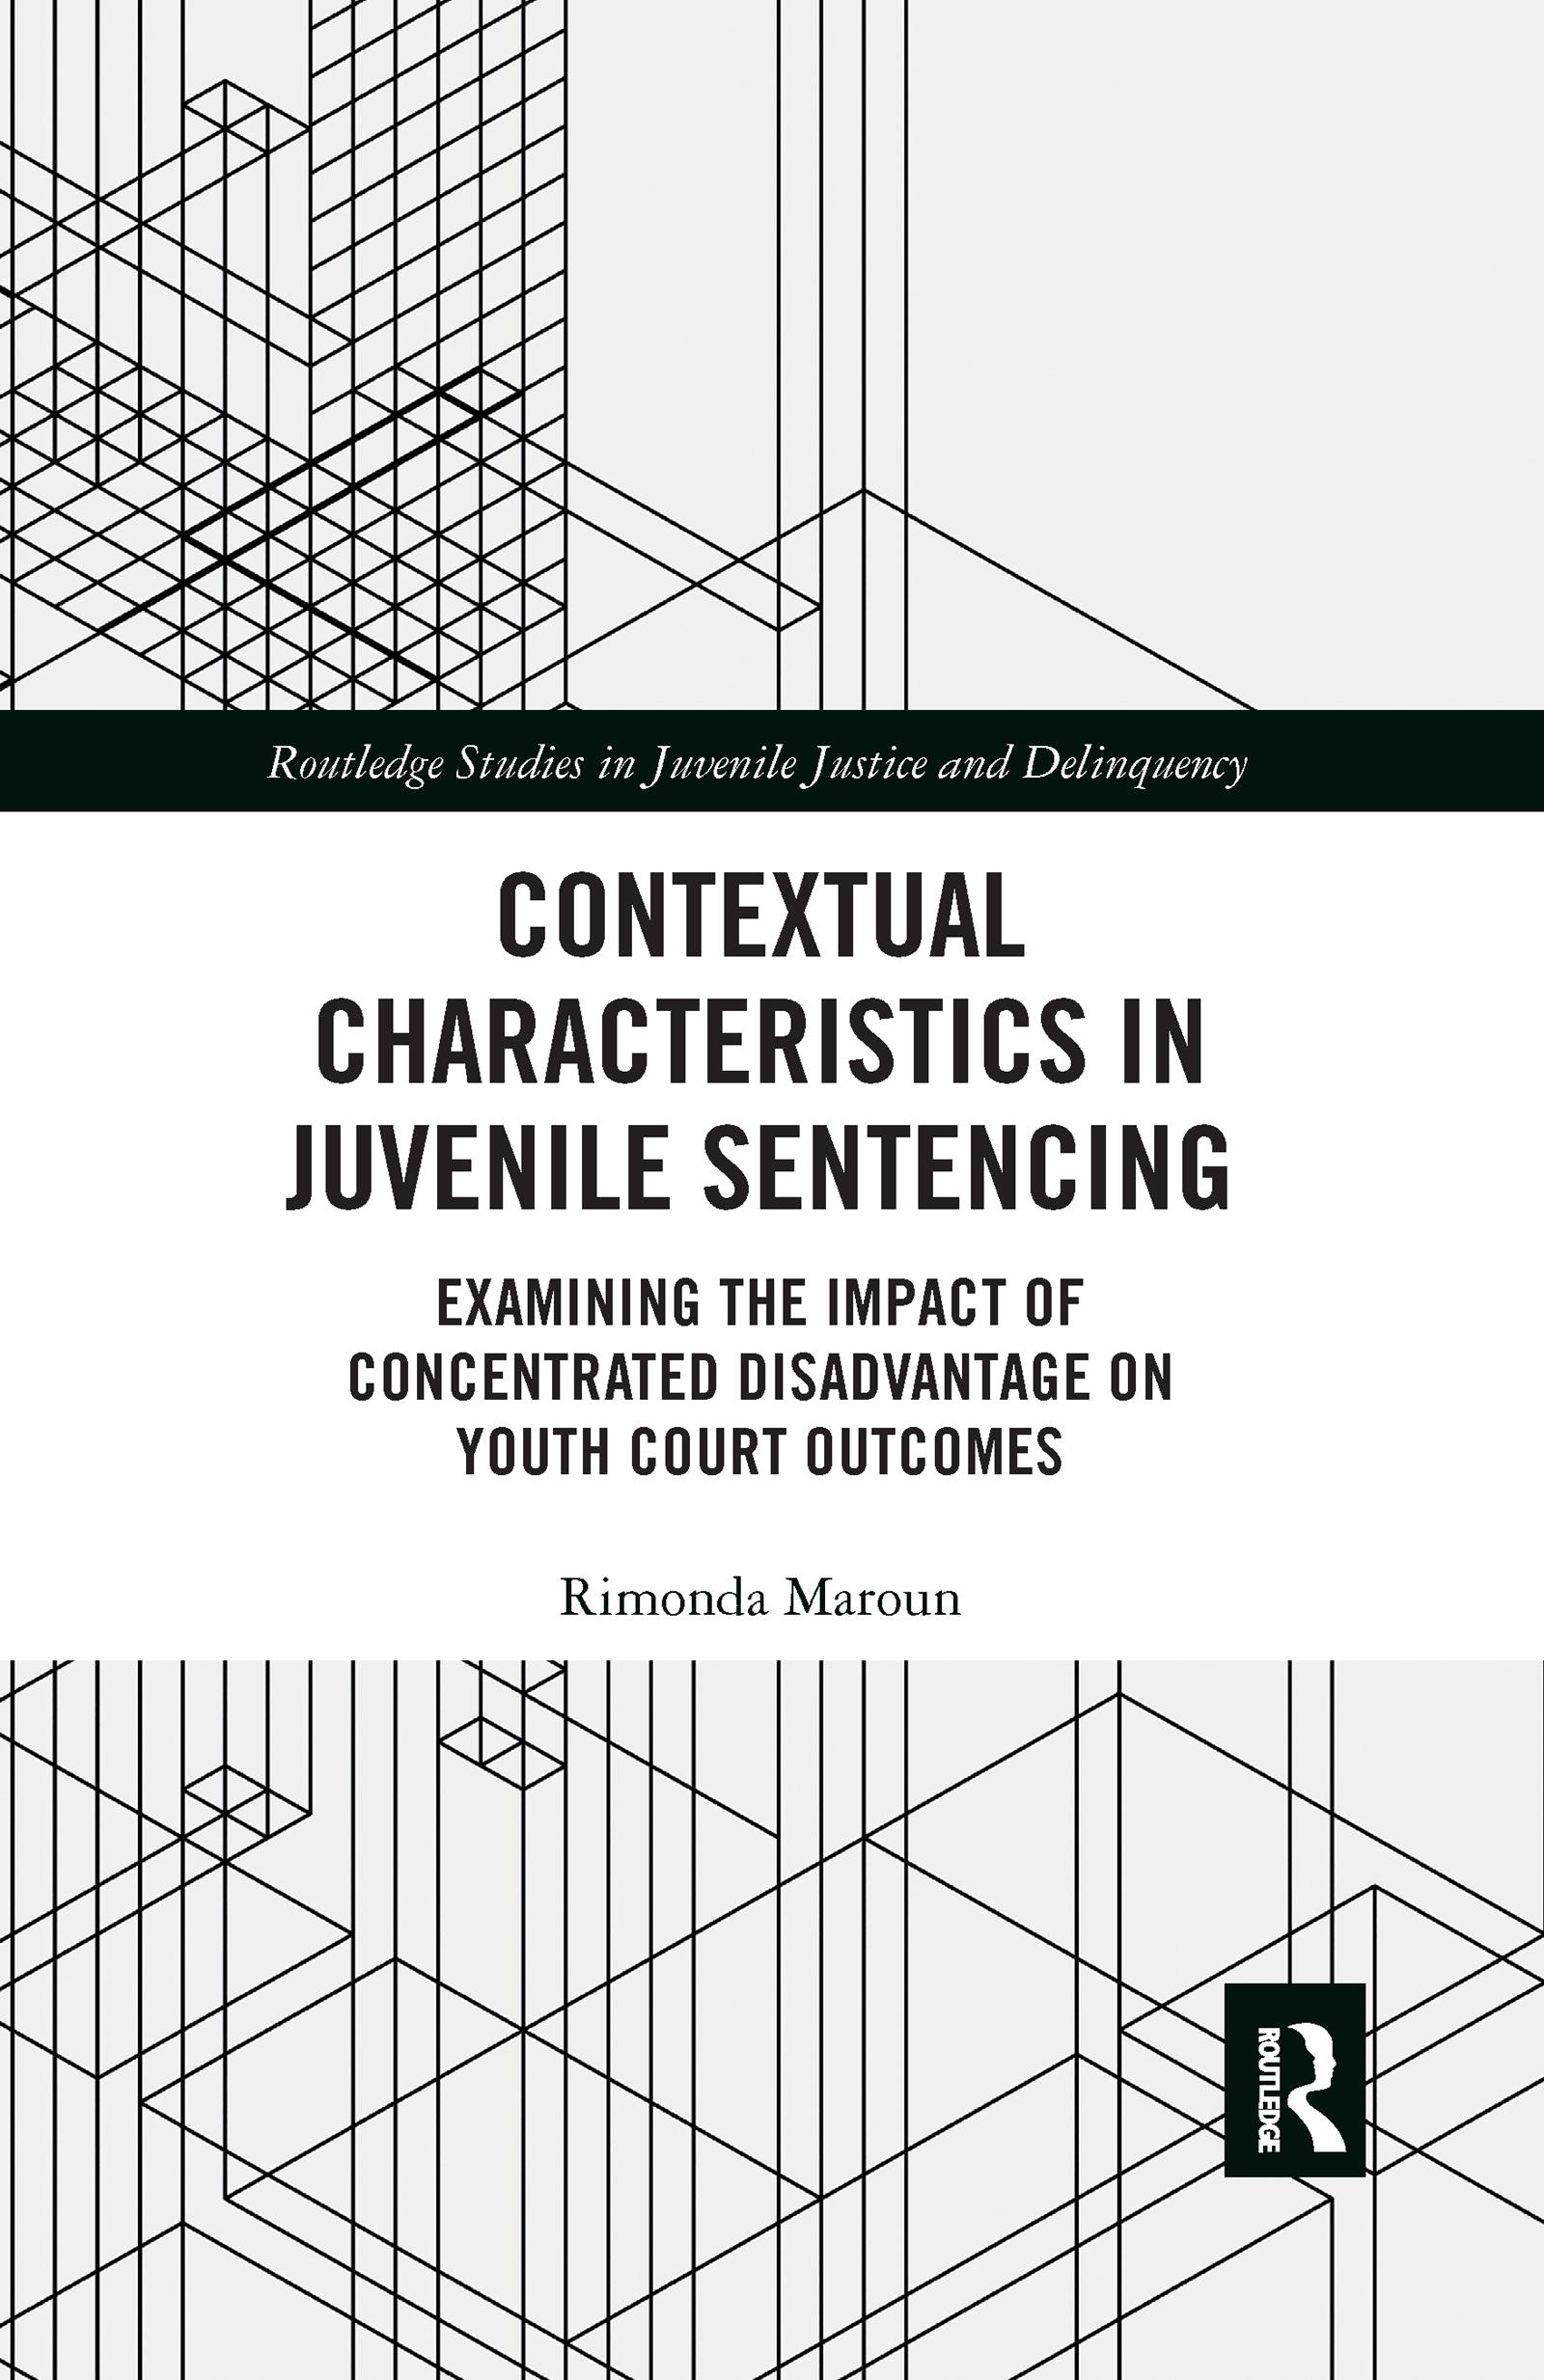 Contextual Characteristics in Juvenile Sentencing